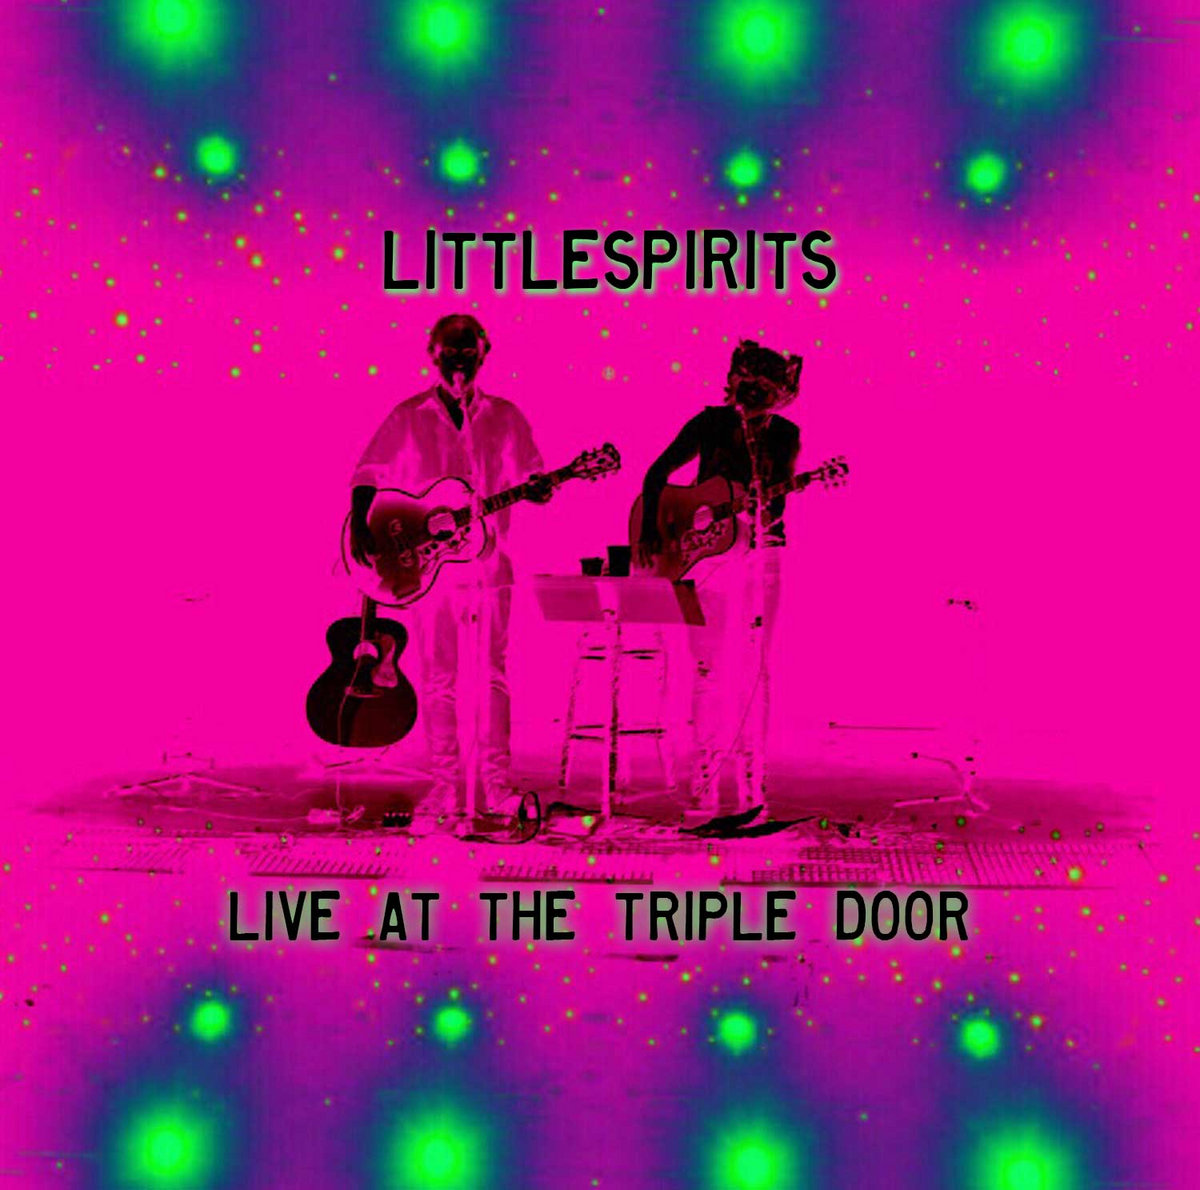 LITTLESPIRITS Live at The Triple Door & LITTLESPIRITS Live at The Triple Door | LITTLESPIRITS